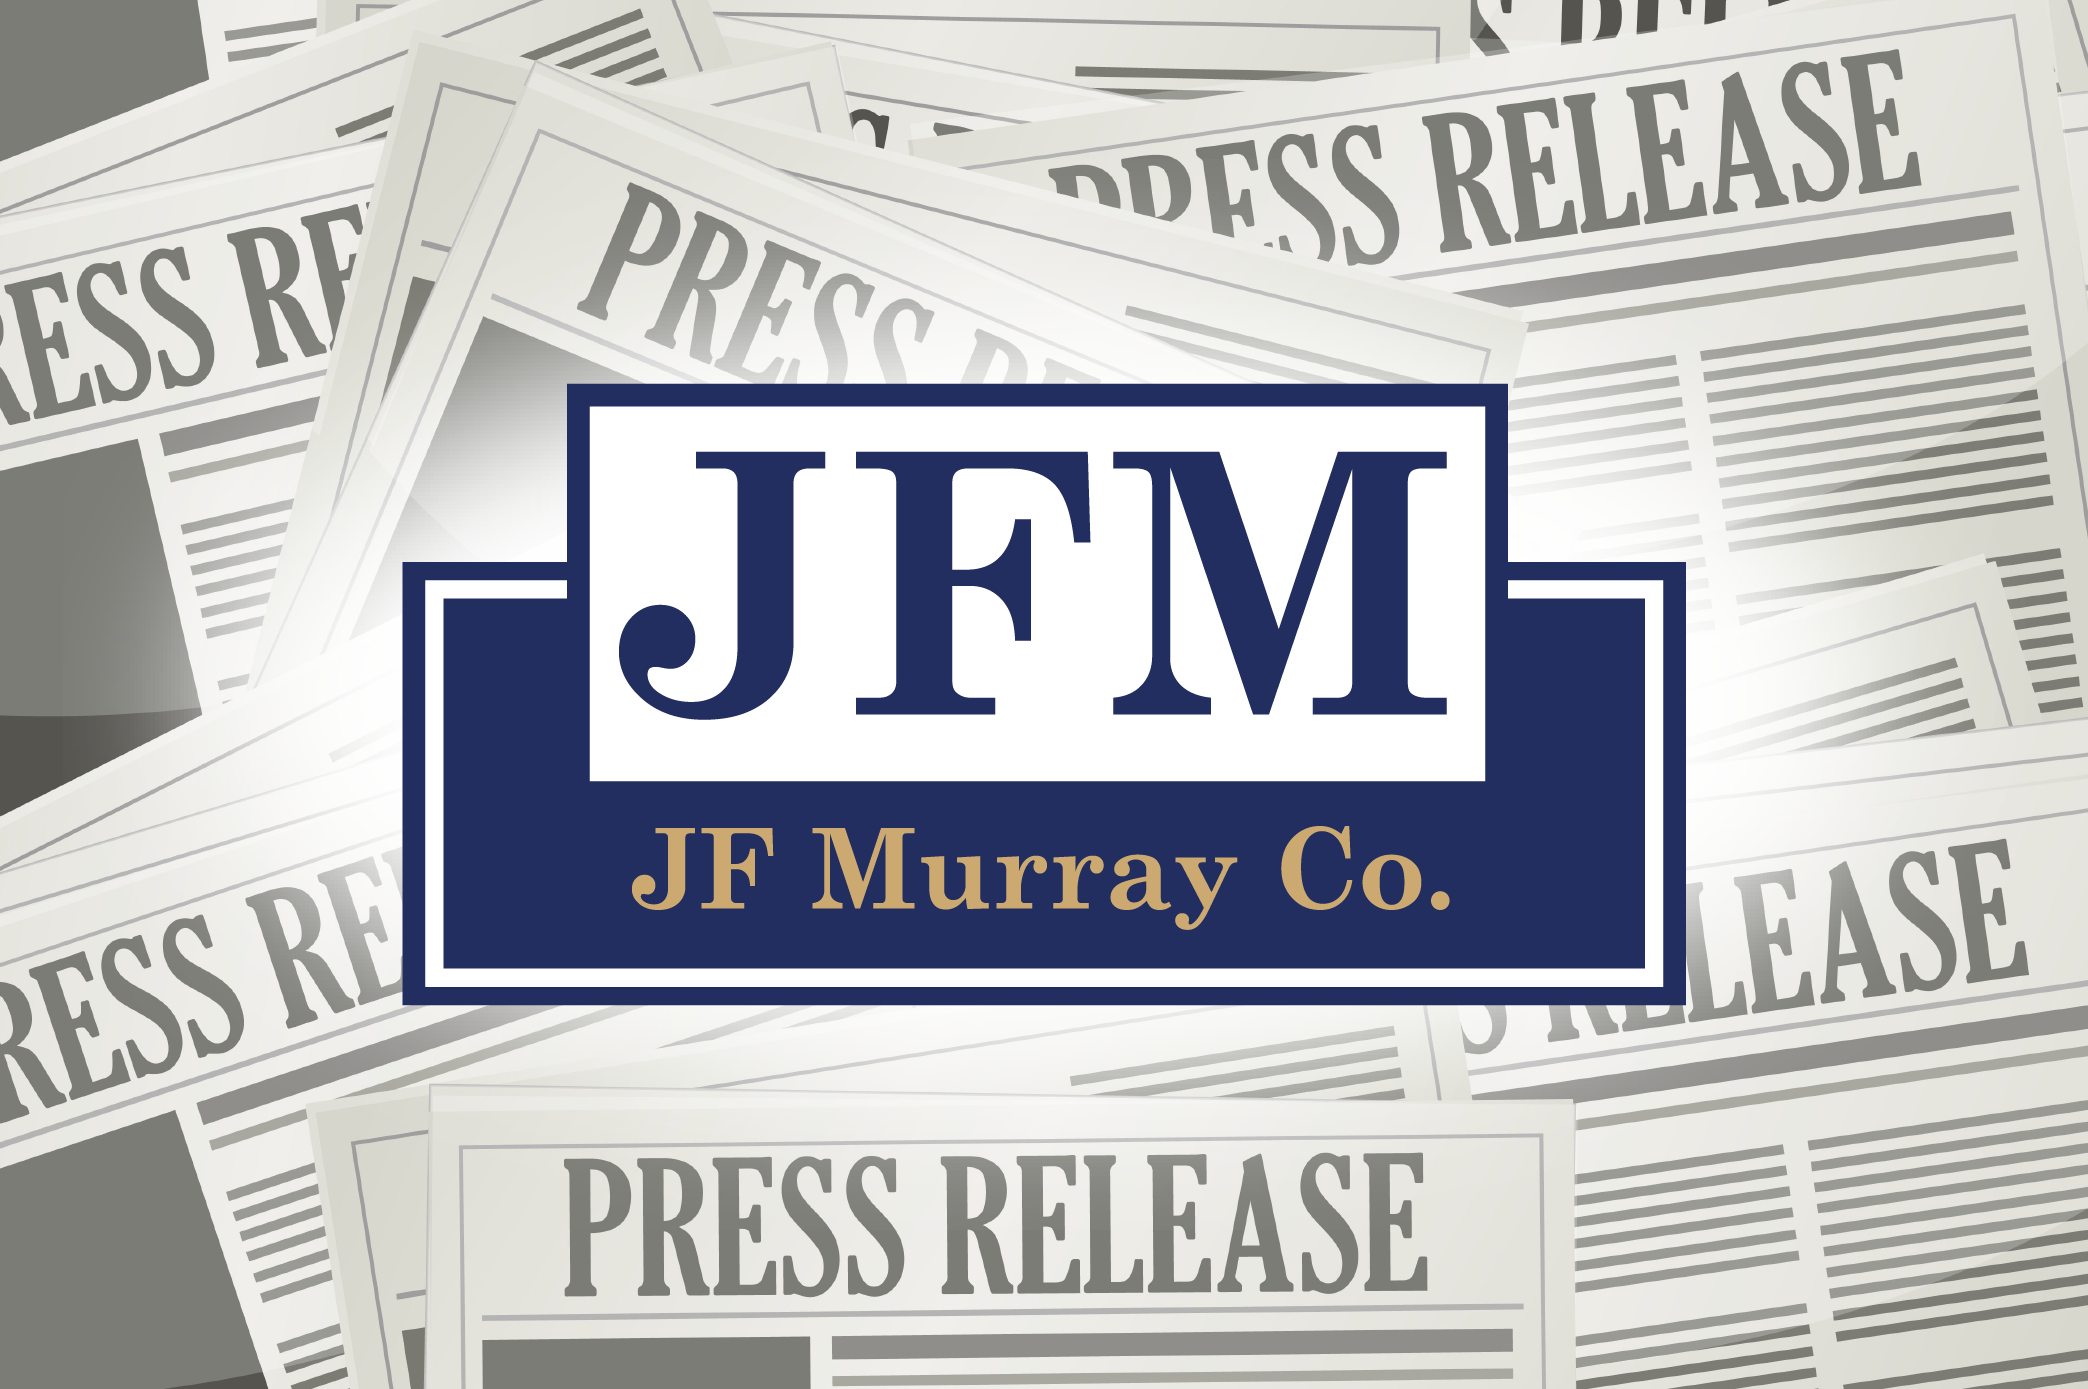 JFM - JF Murray Co.